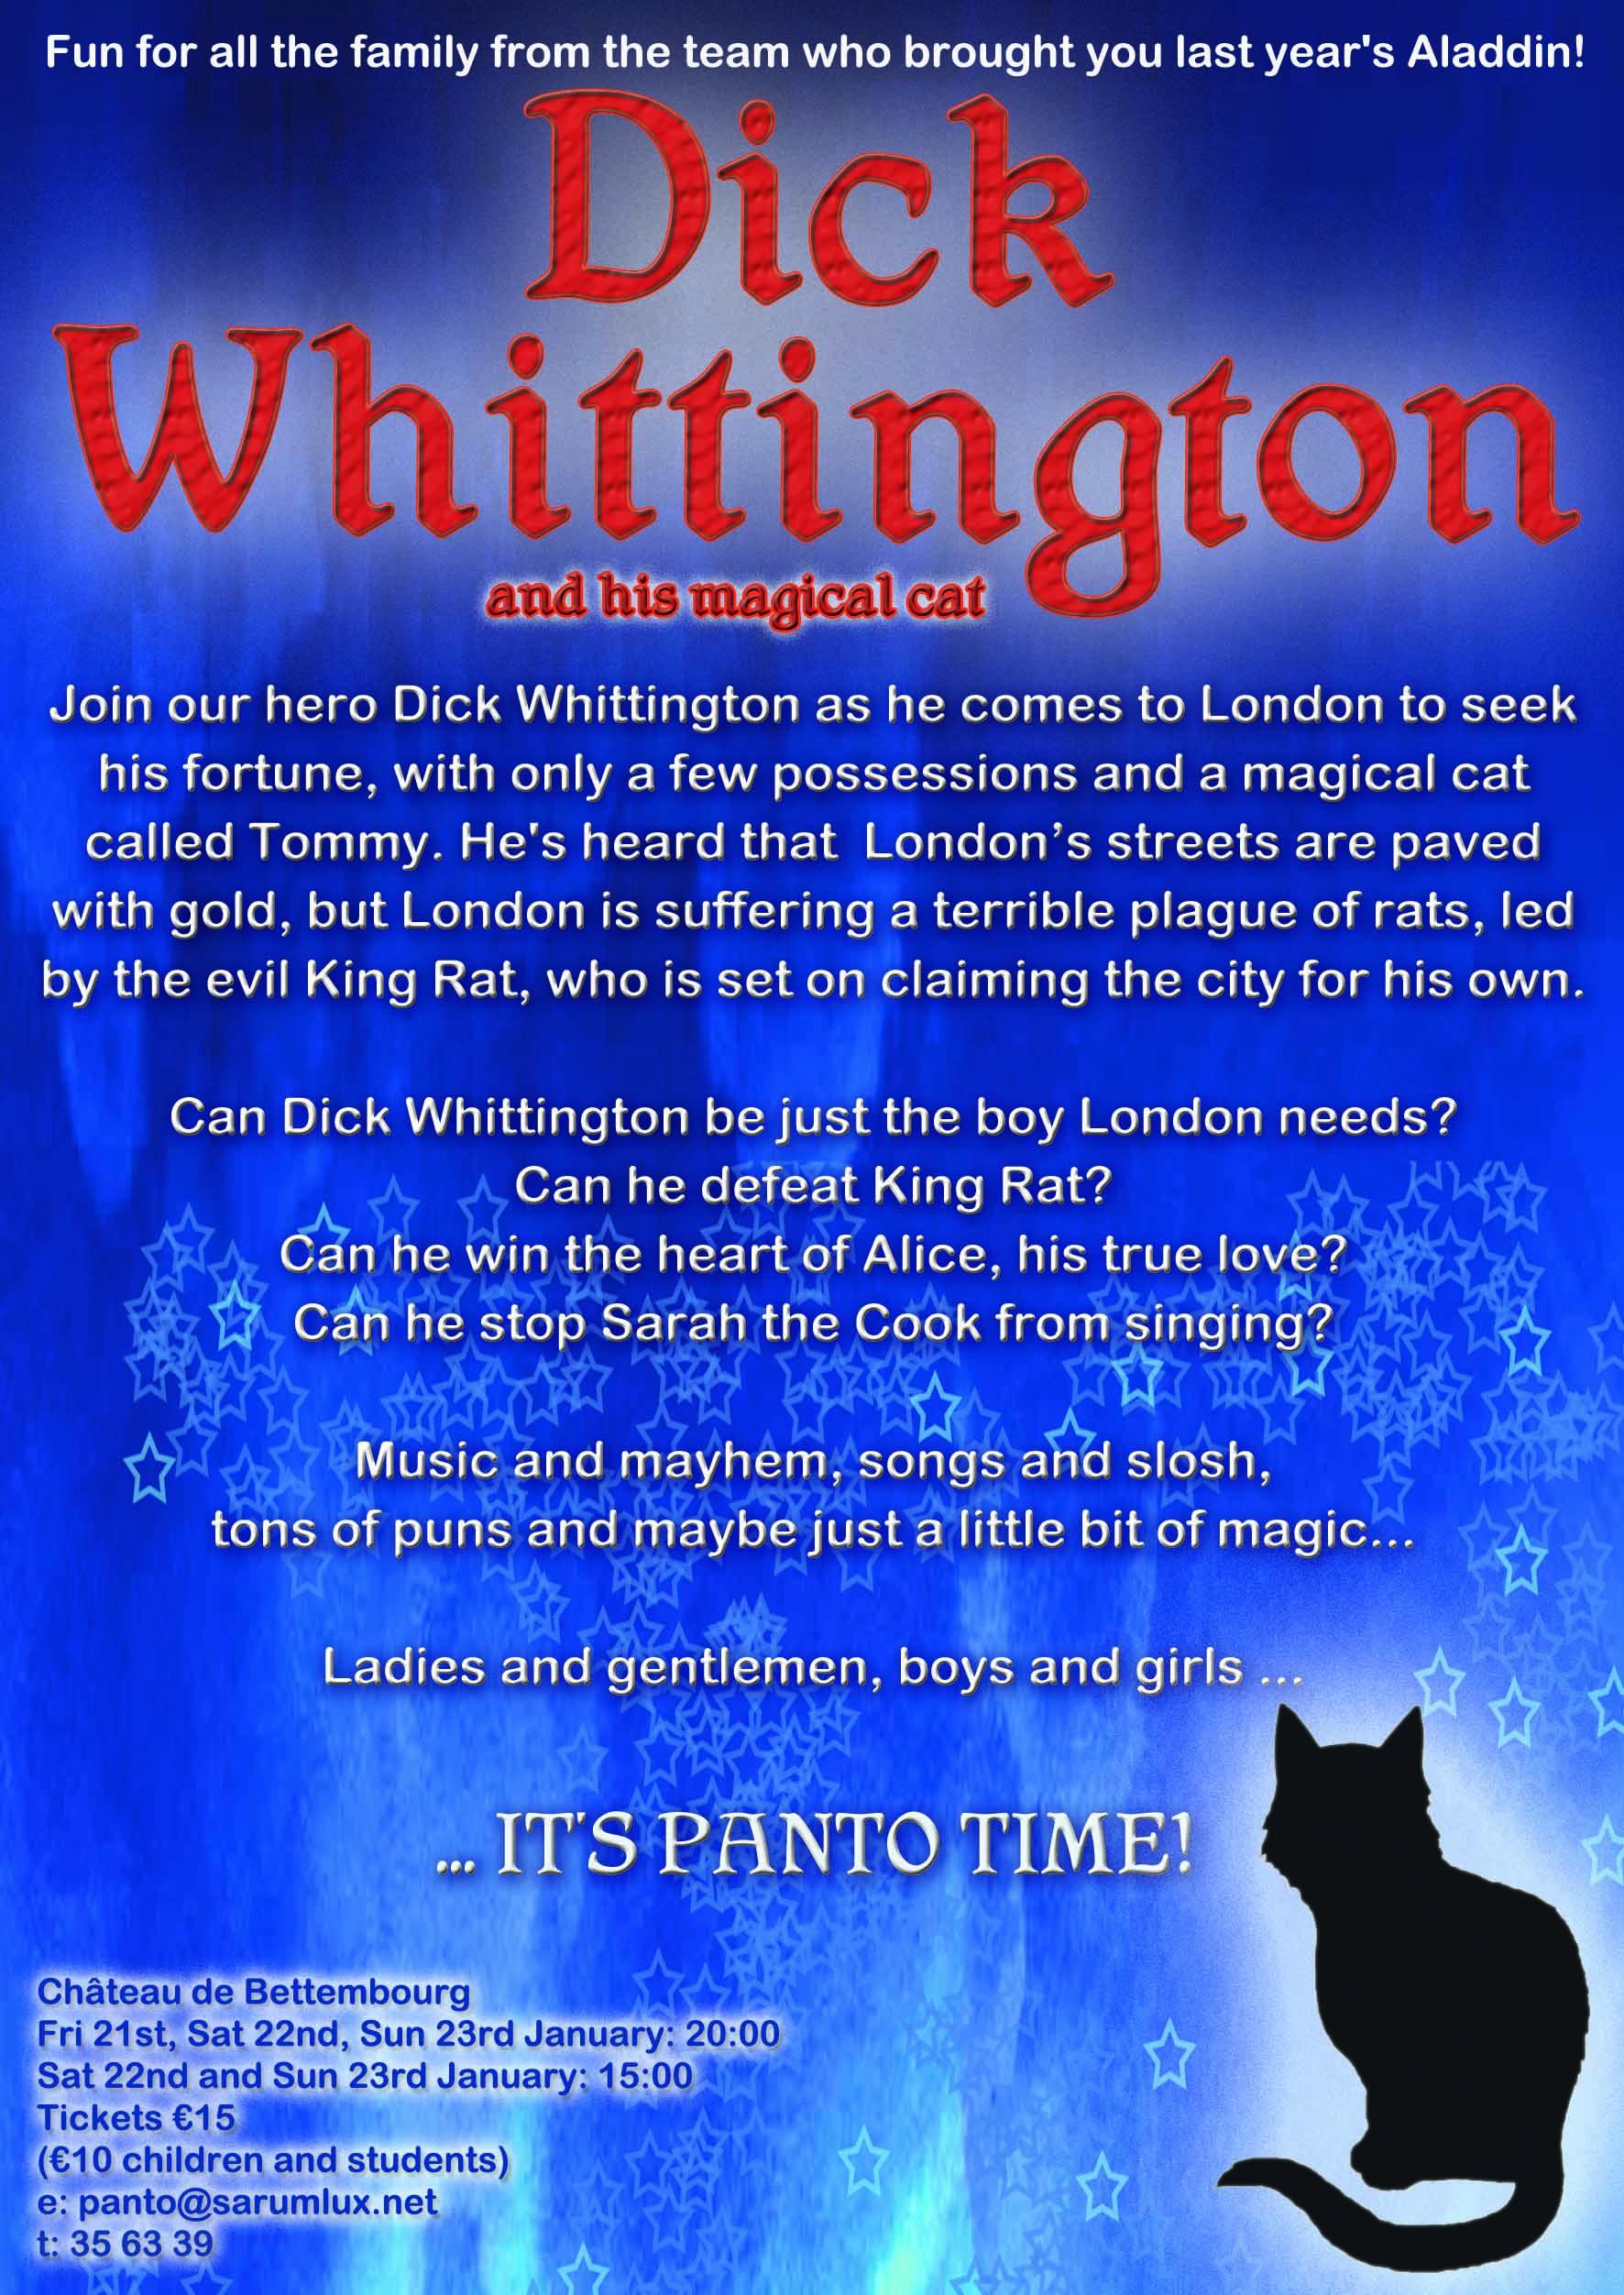 Dick Whittington Information